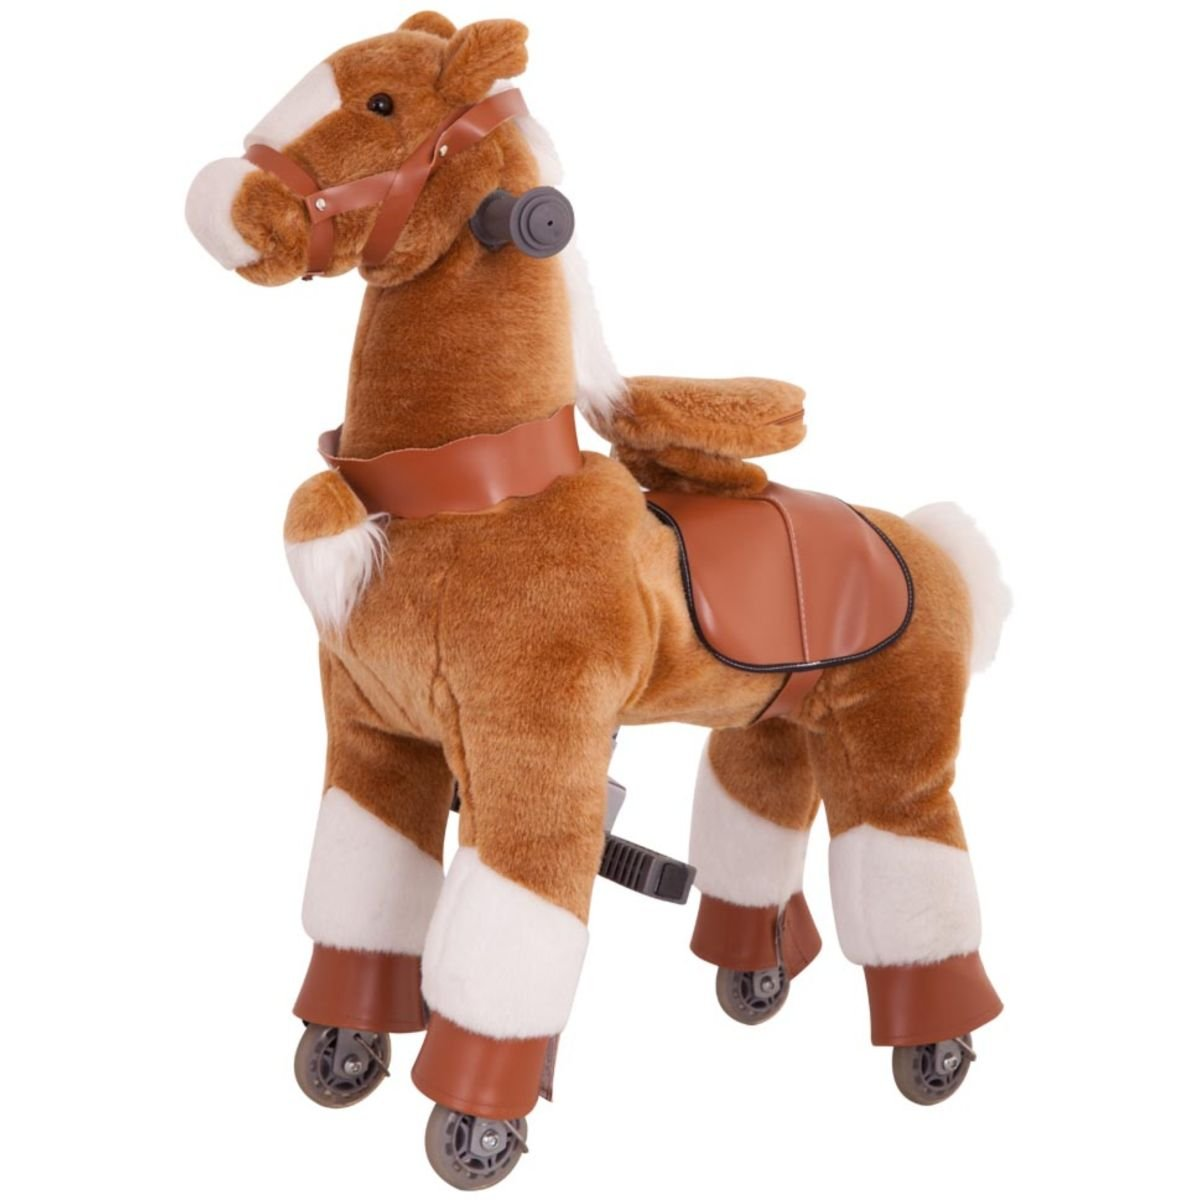 Obrázek BR Toy Horse Pebbels Small Brown S